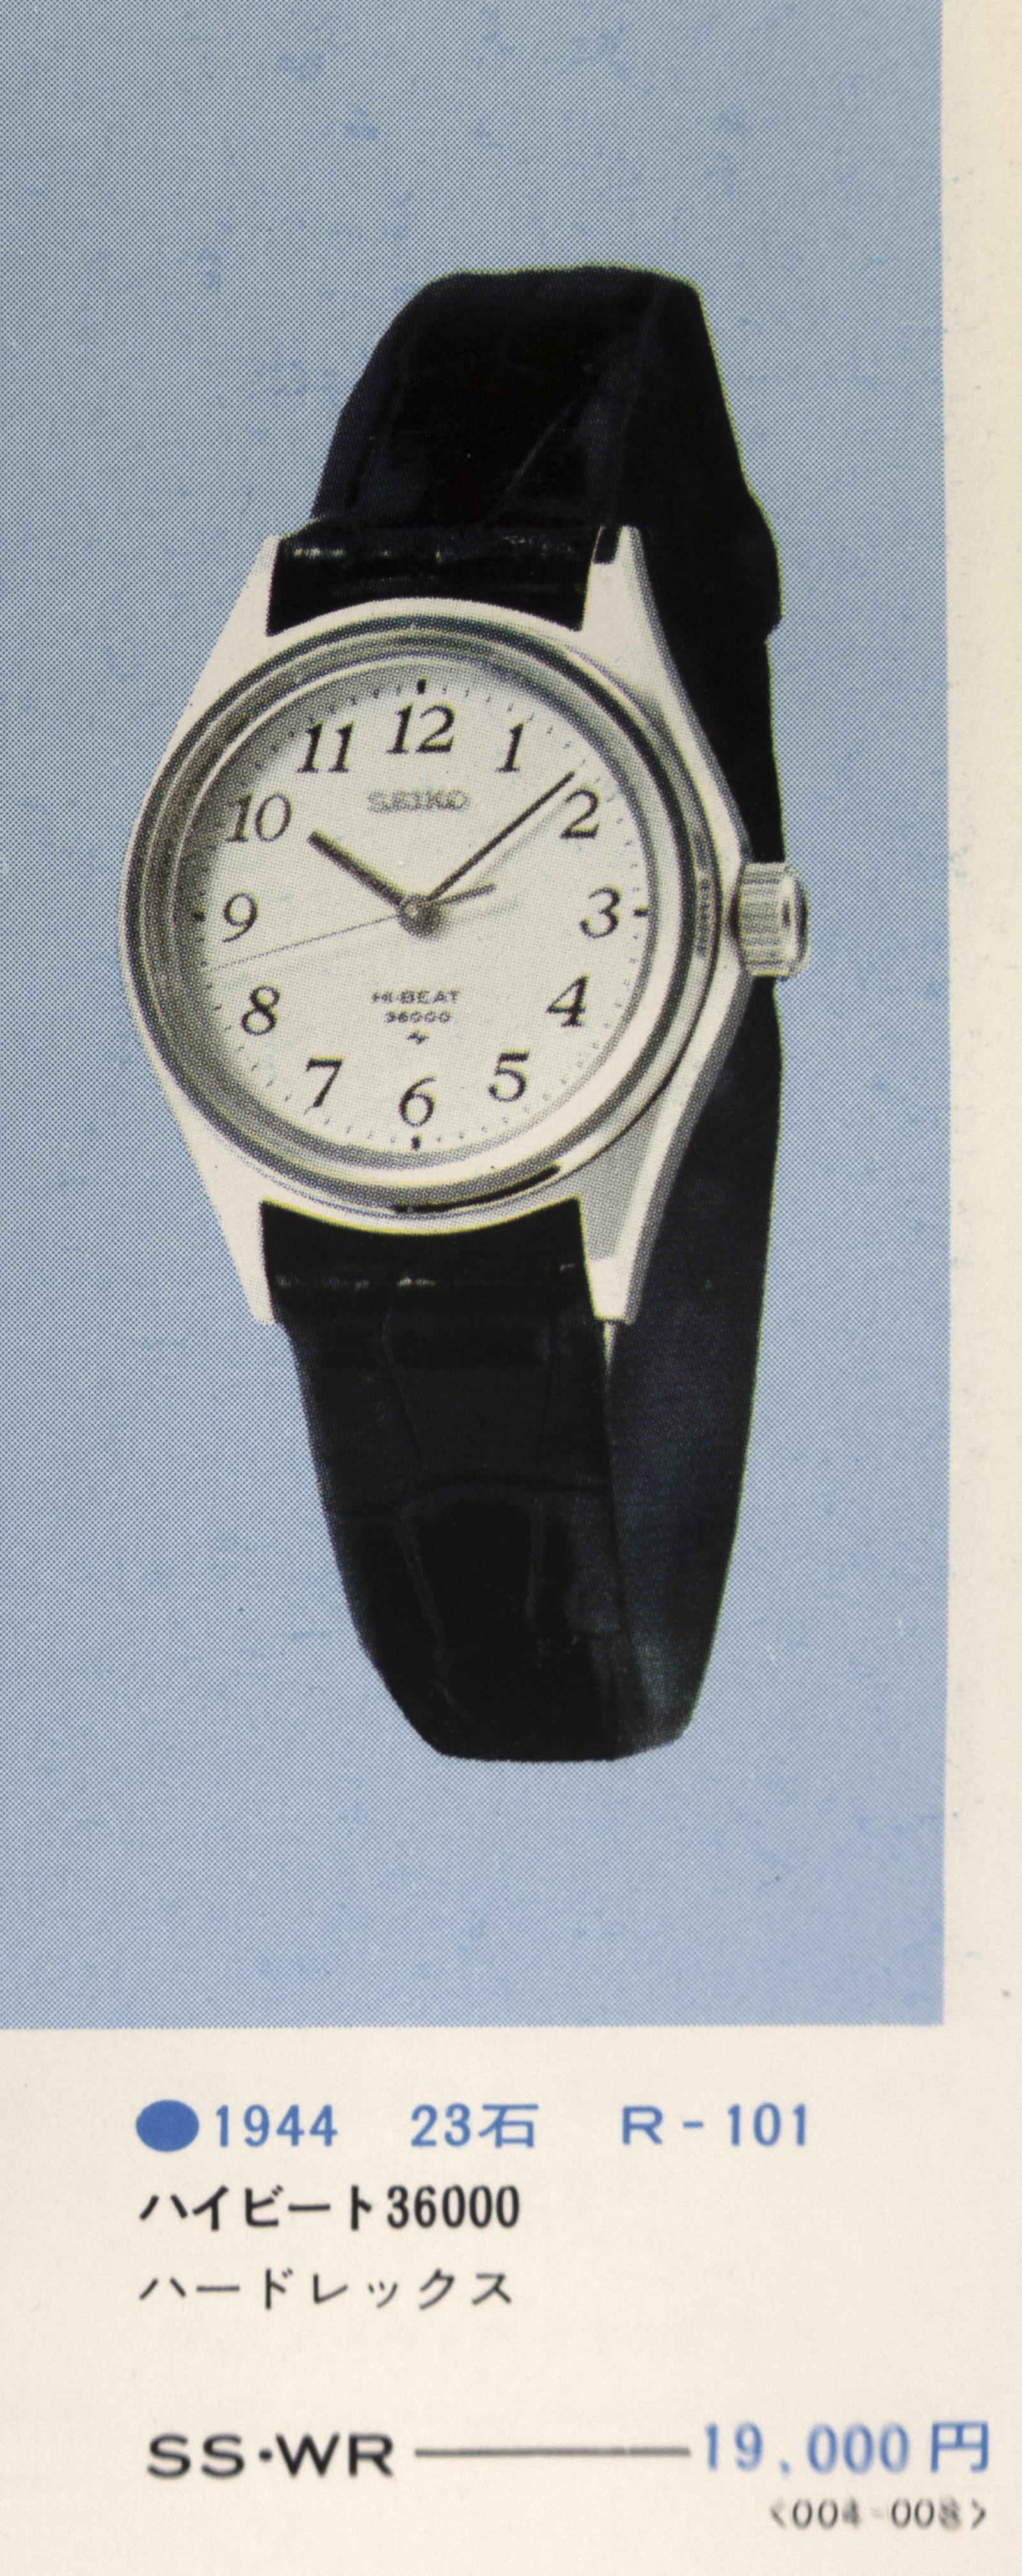 1944 R-101